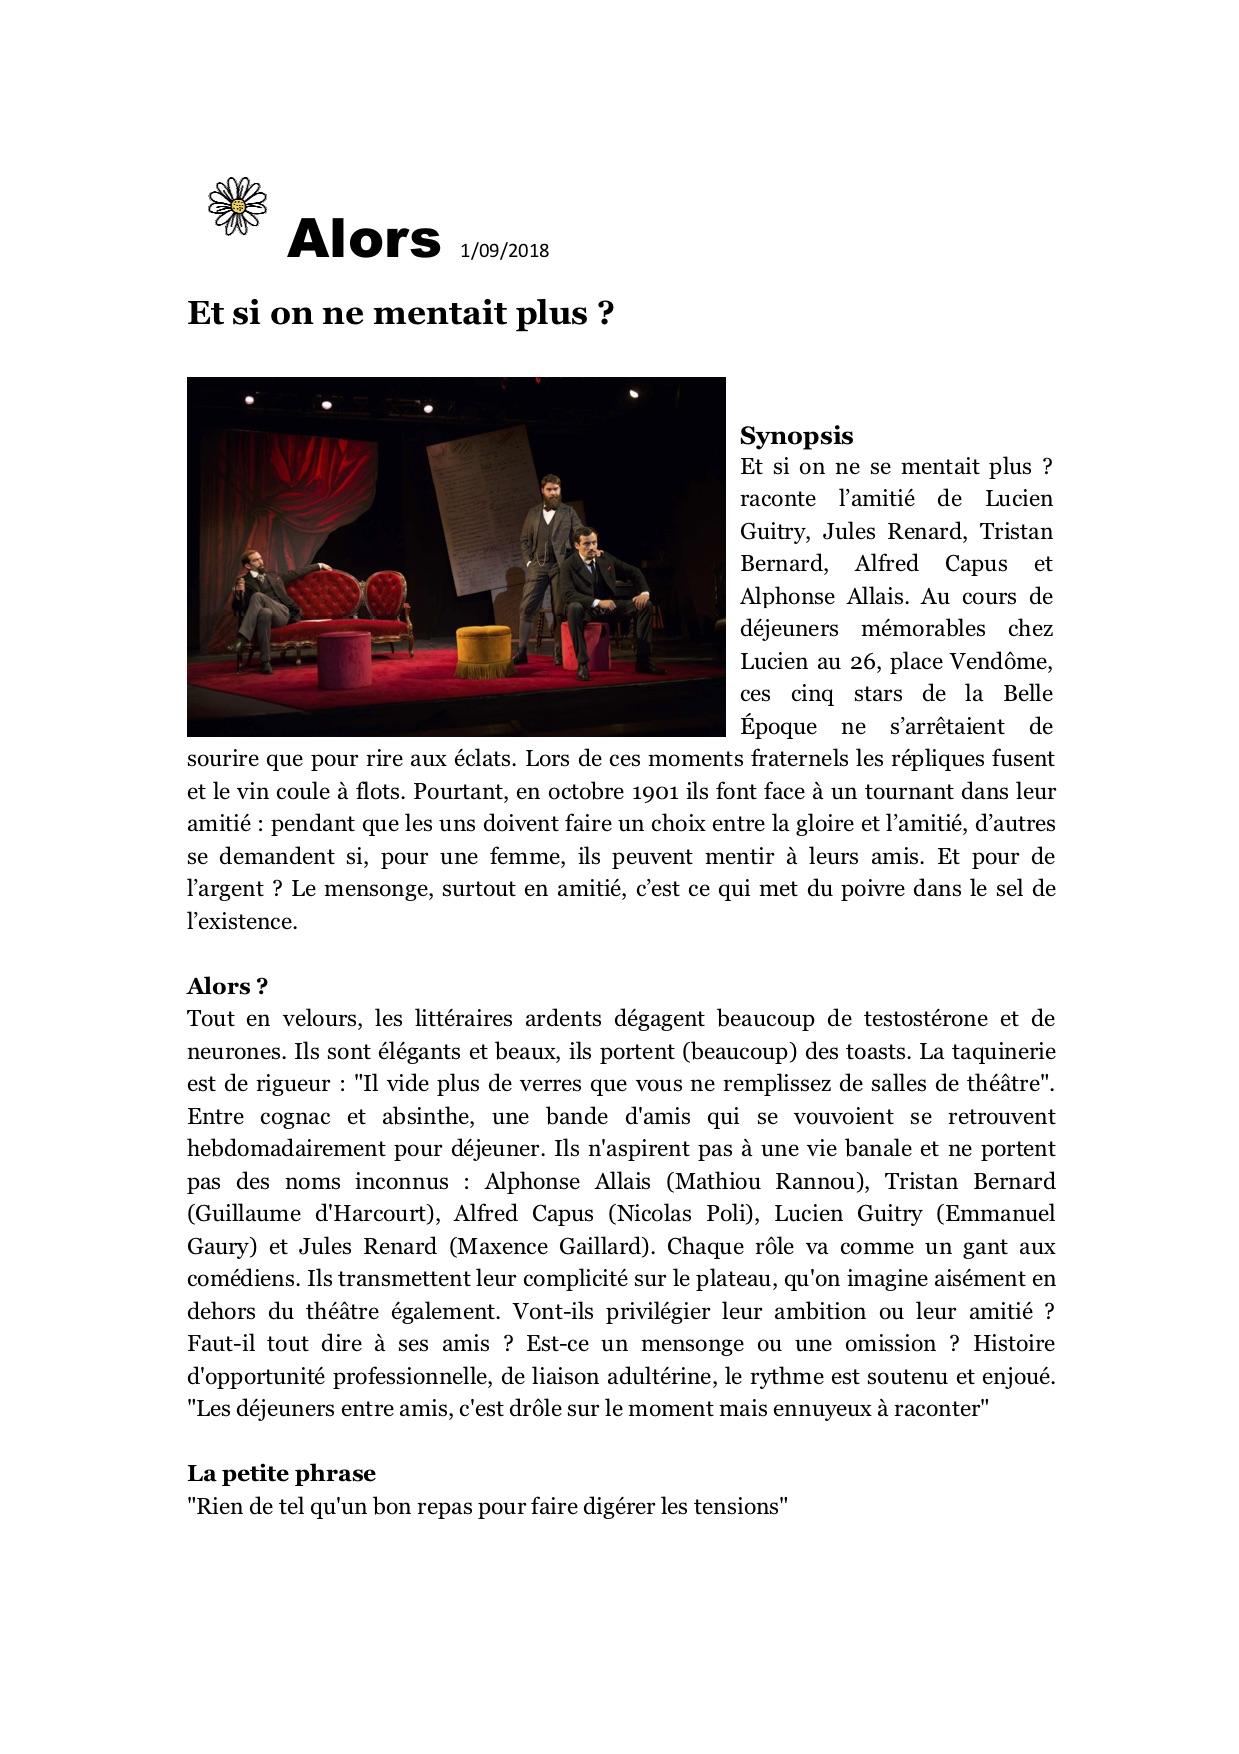 ALORS blog 01.09.18